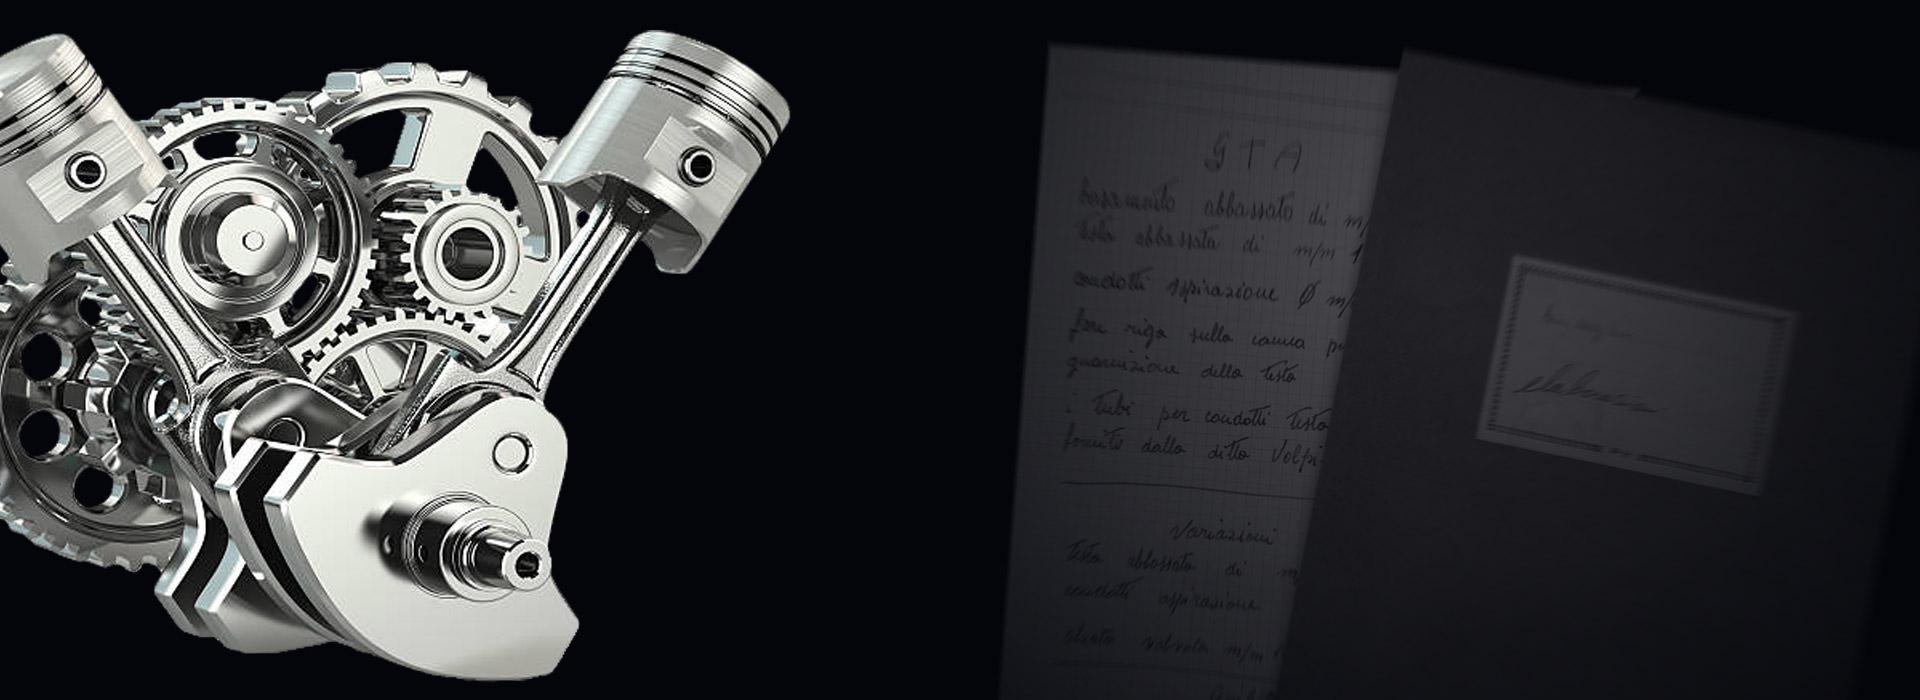 header-autofficina-torino-racing-elaborazioni-gta